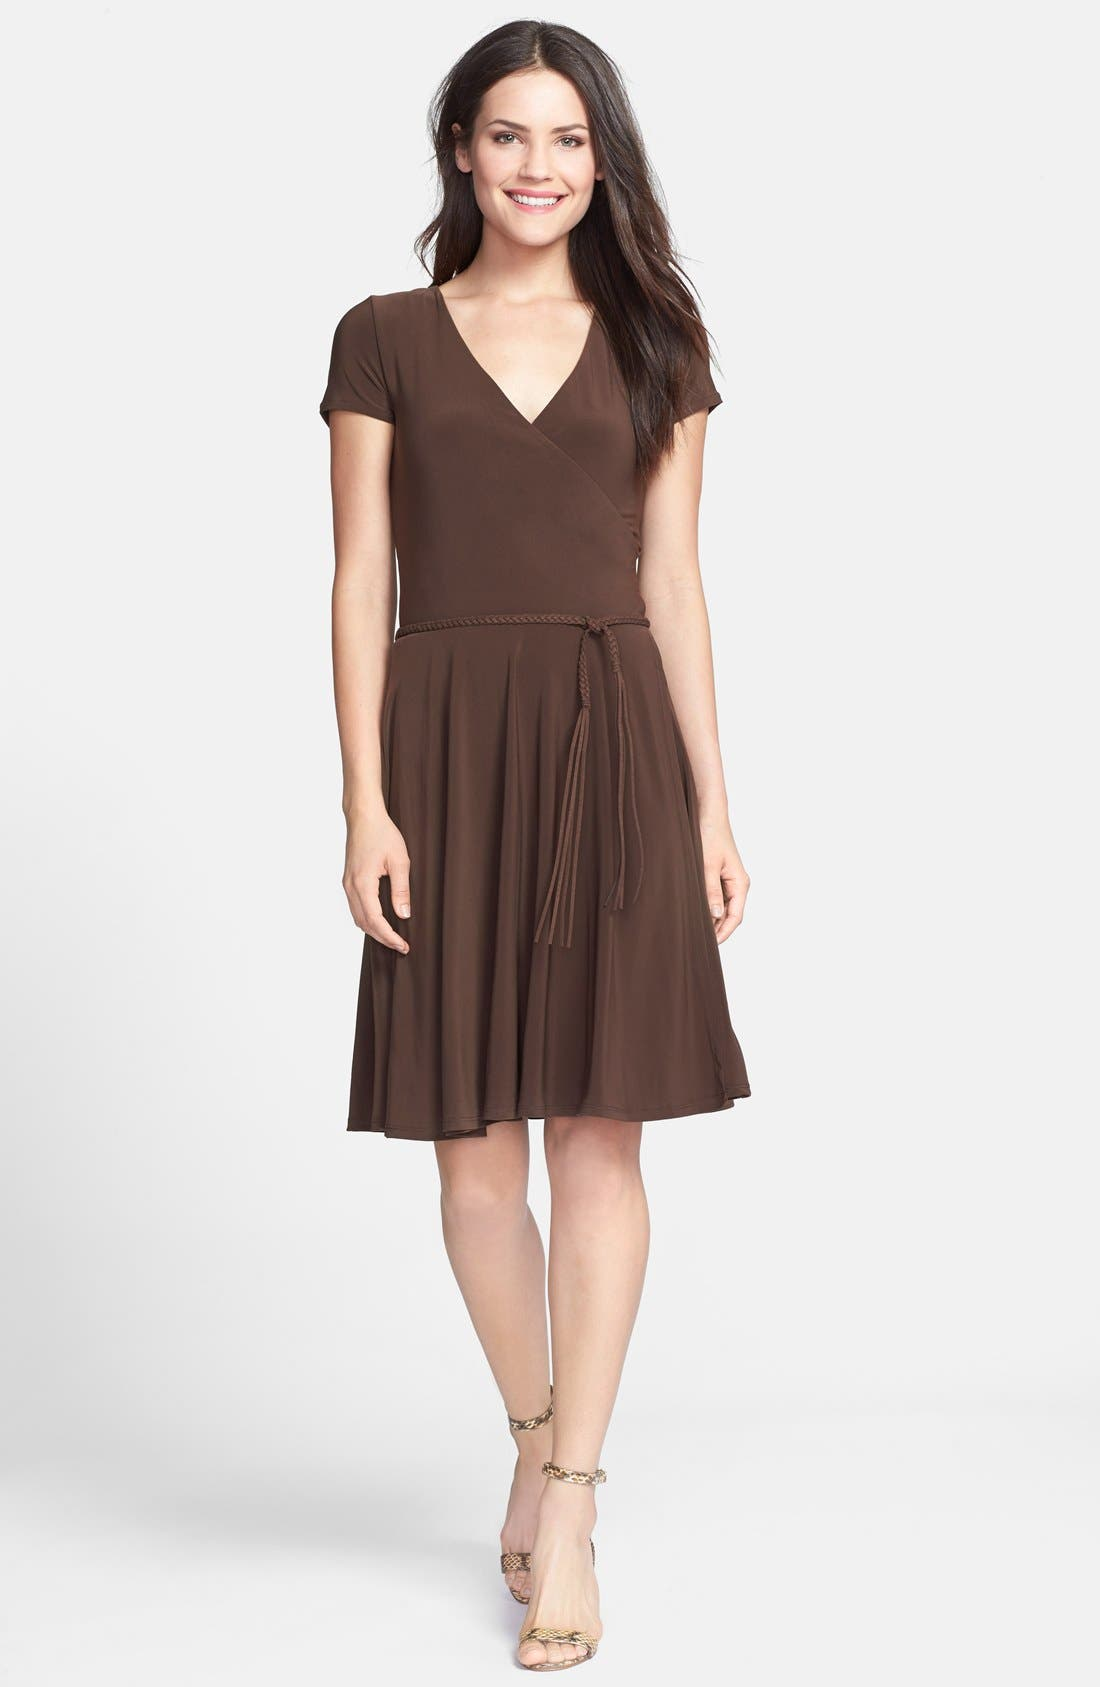 Alternate Image 1 Selected - Lauren Ralph Lauren Belted Fit & Flare Jersey Dress